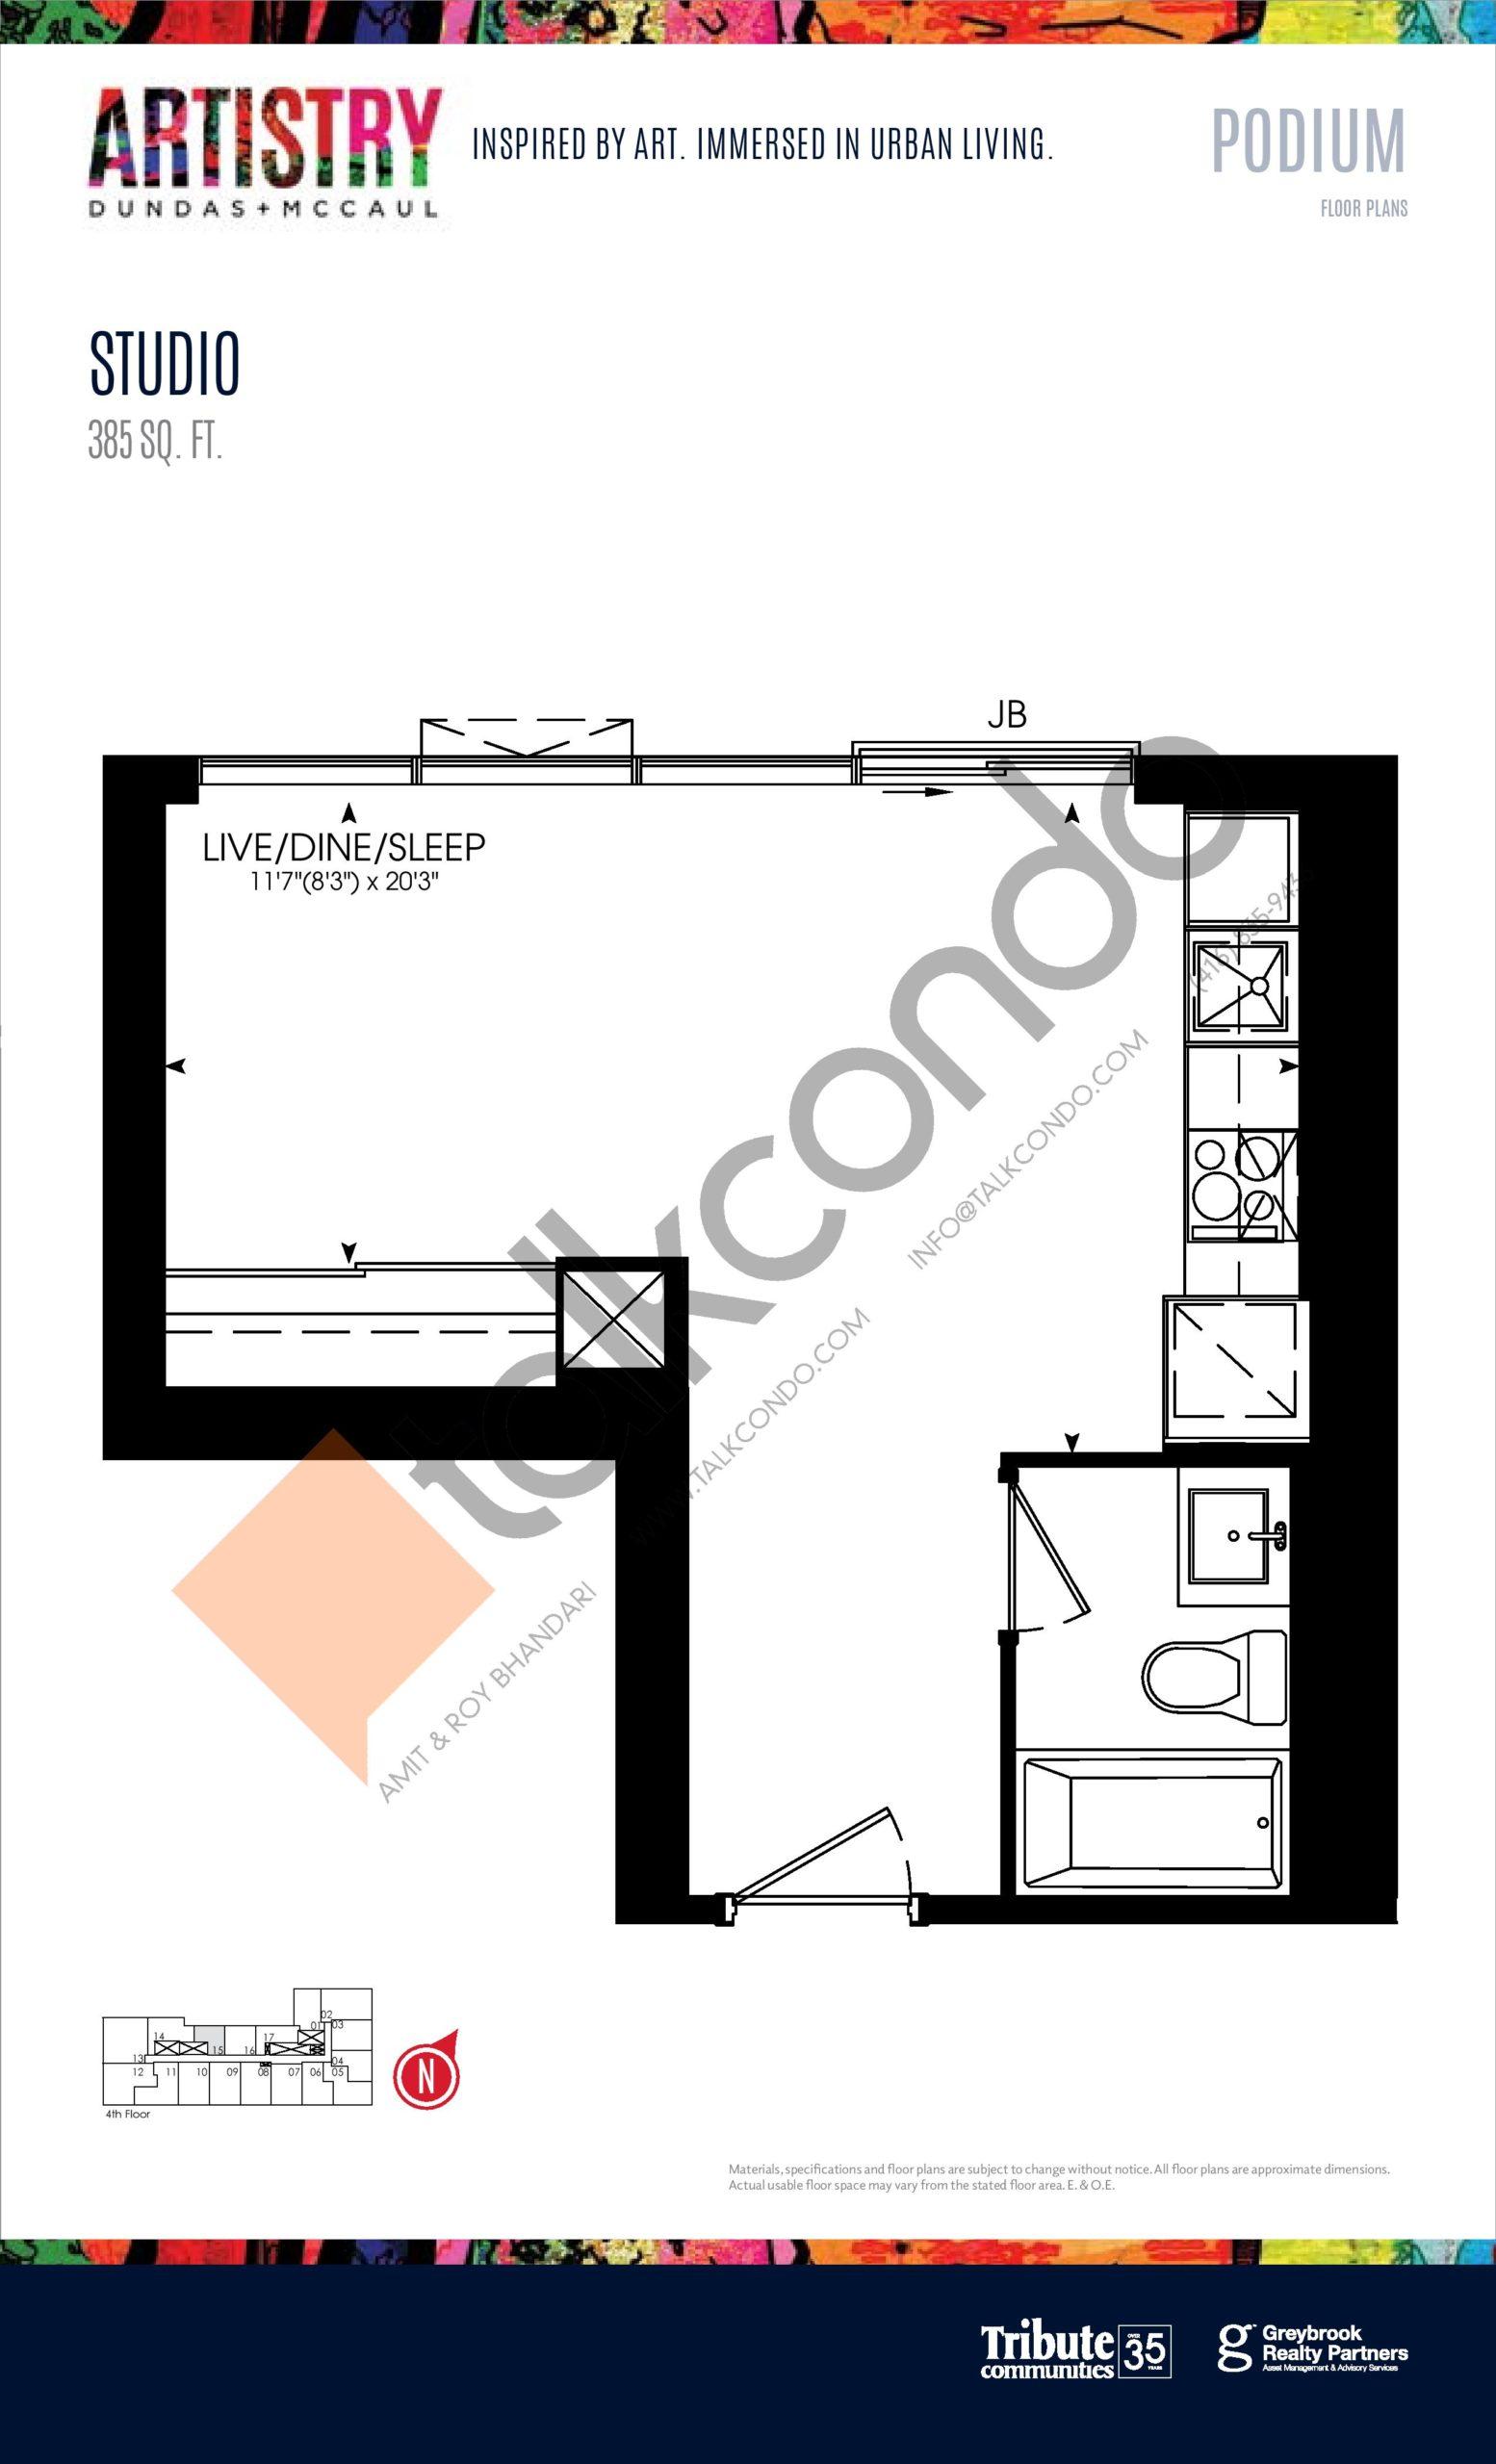 385 sq. ft. - Podium Floor Plan at Artistry Condos - 385 sq.ft